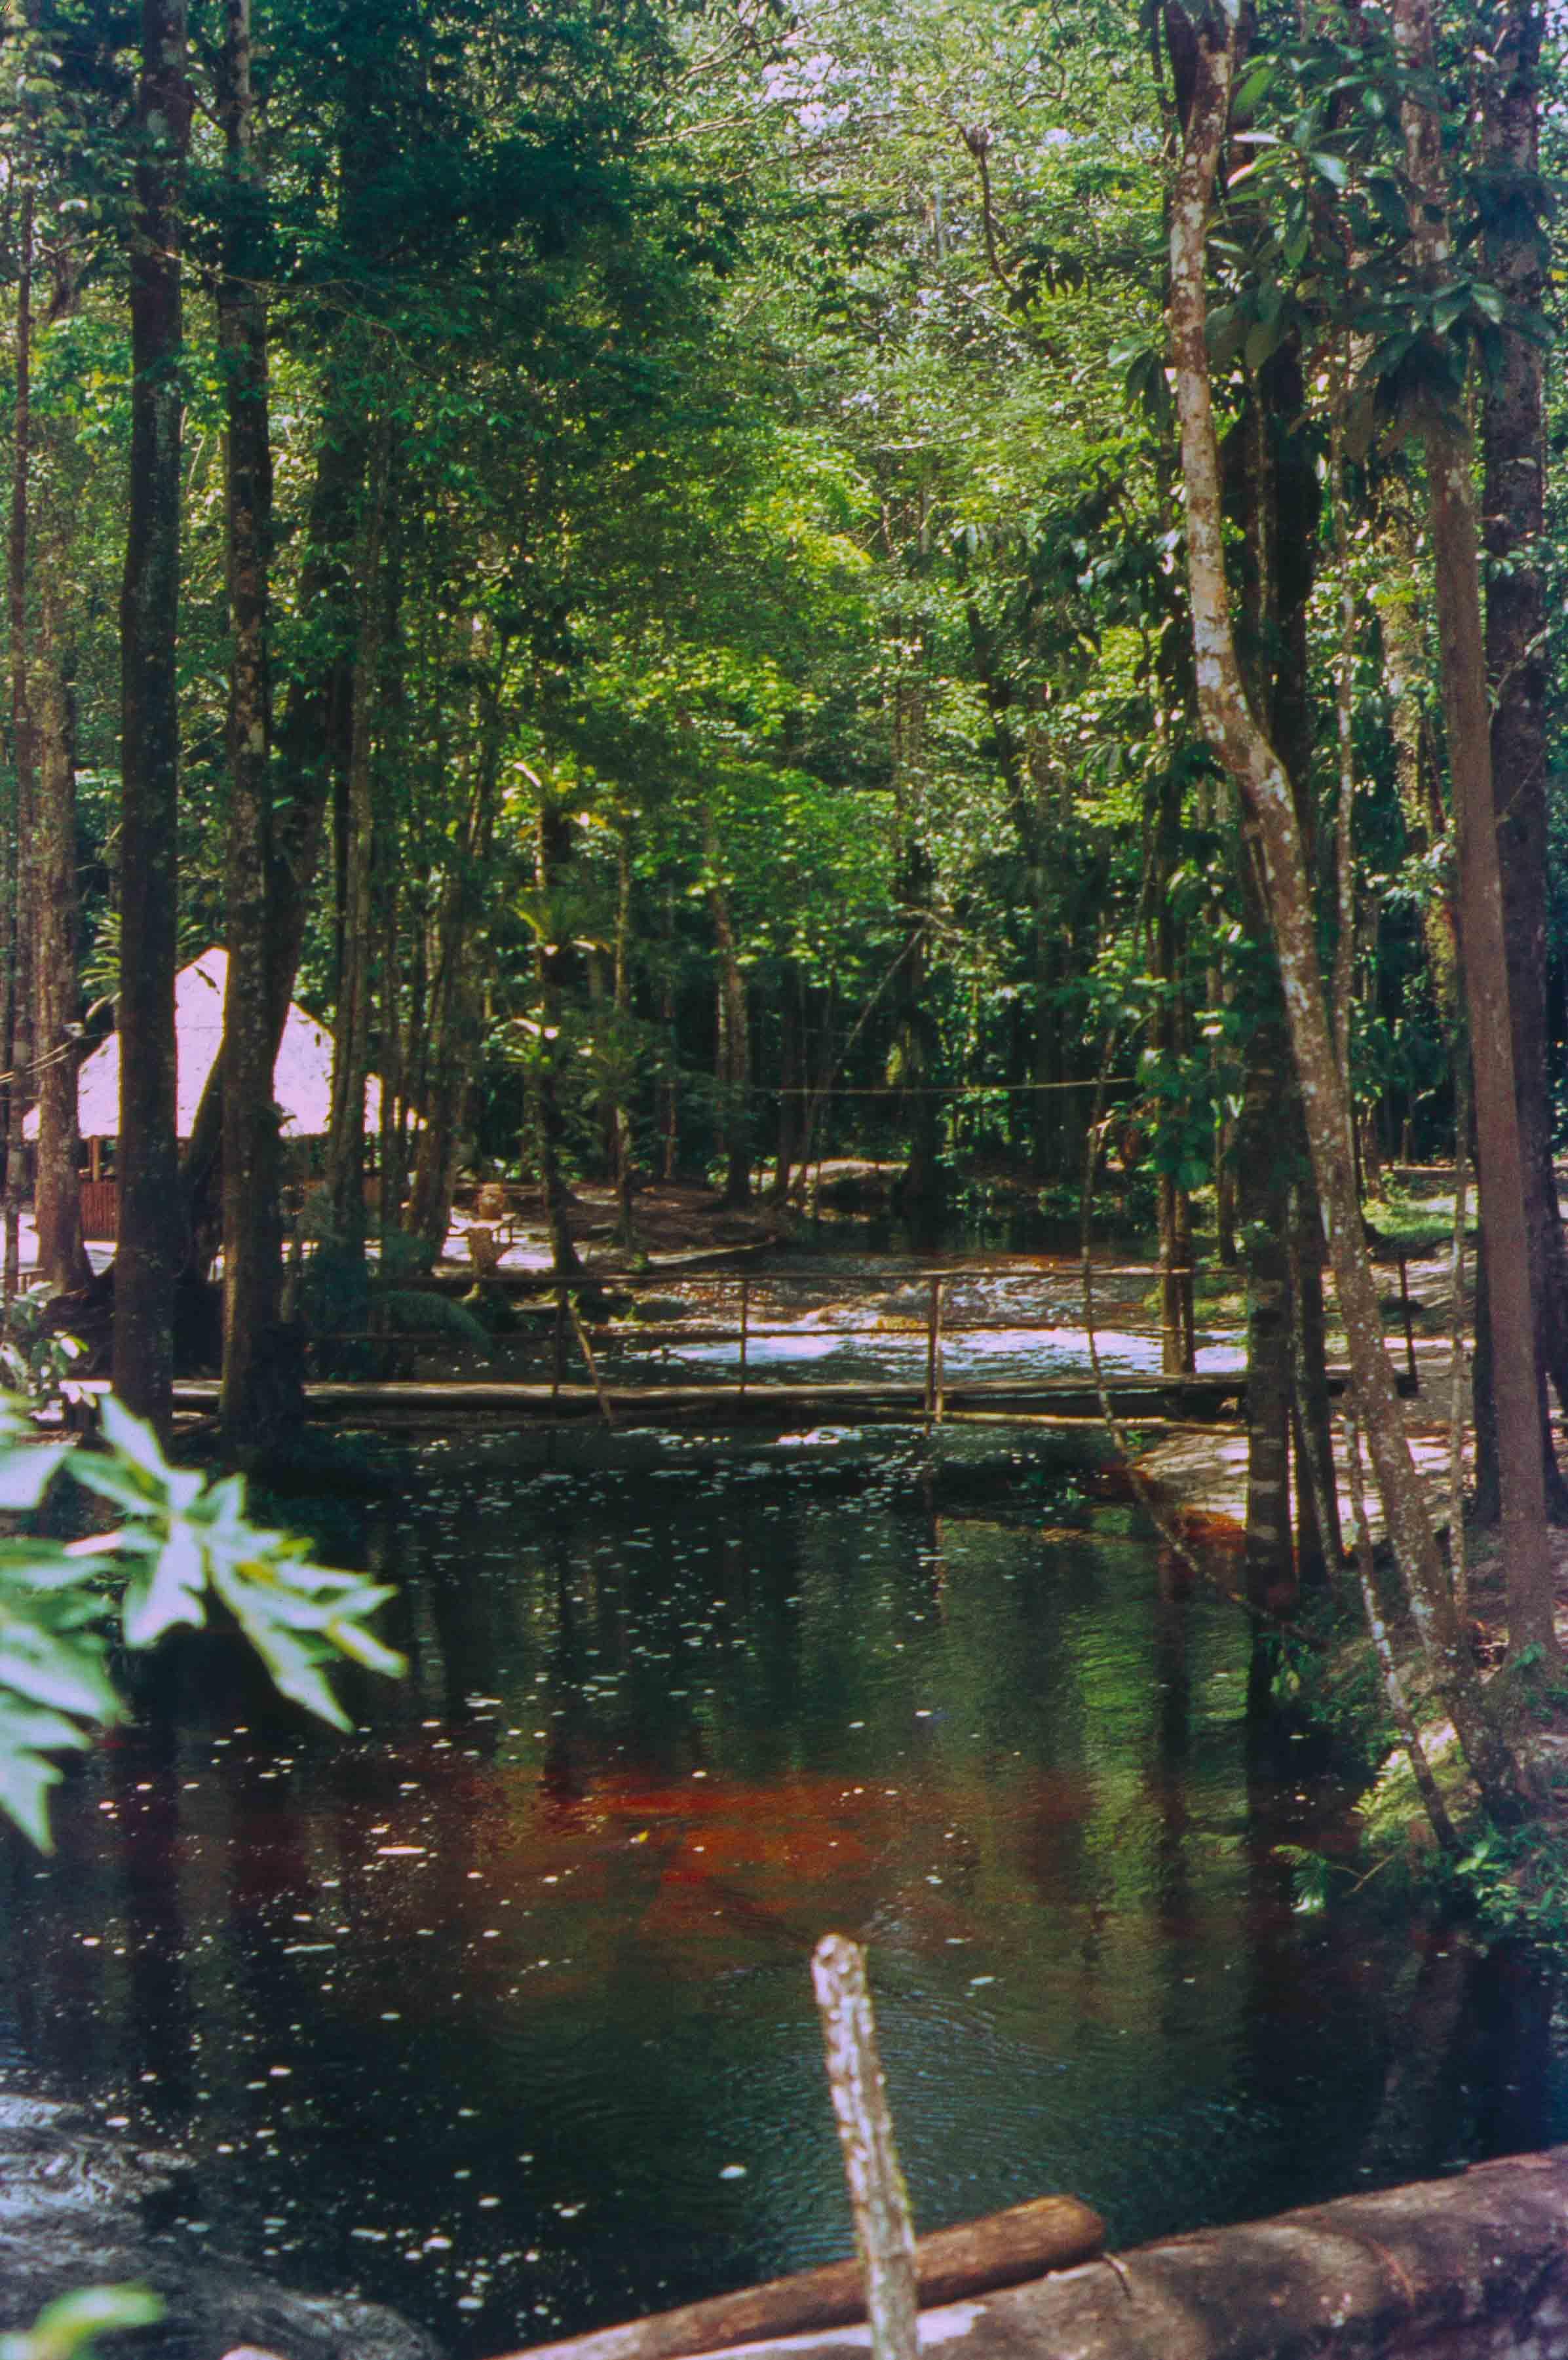 102. Suriname